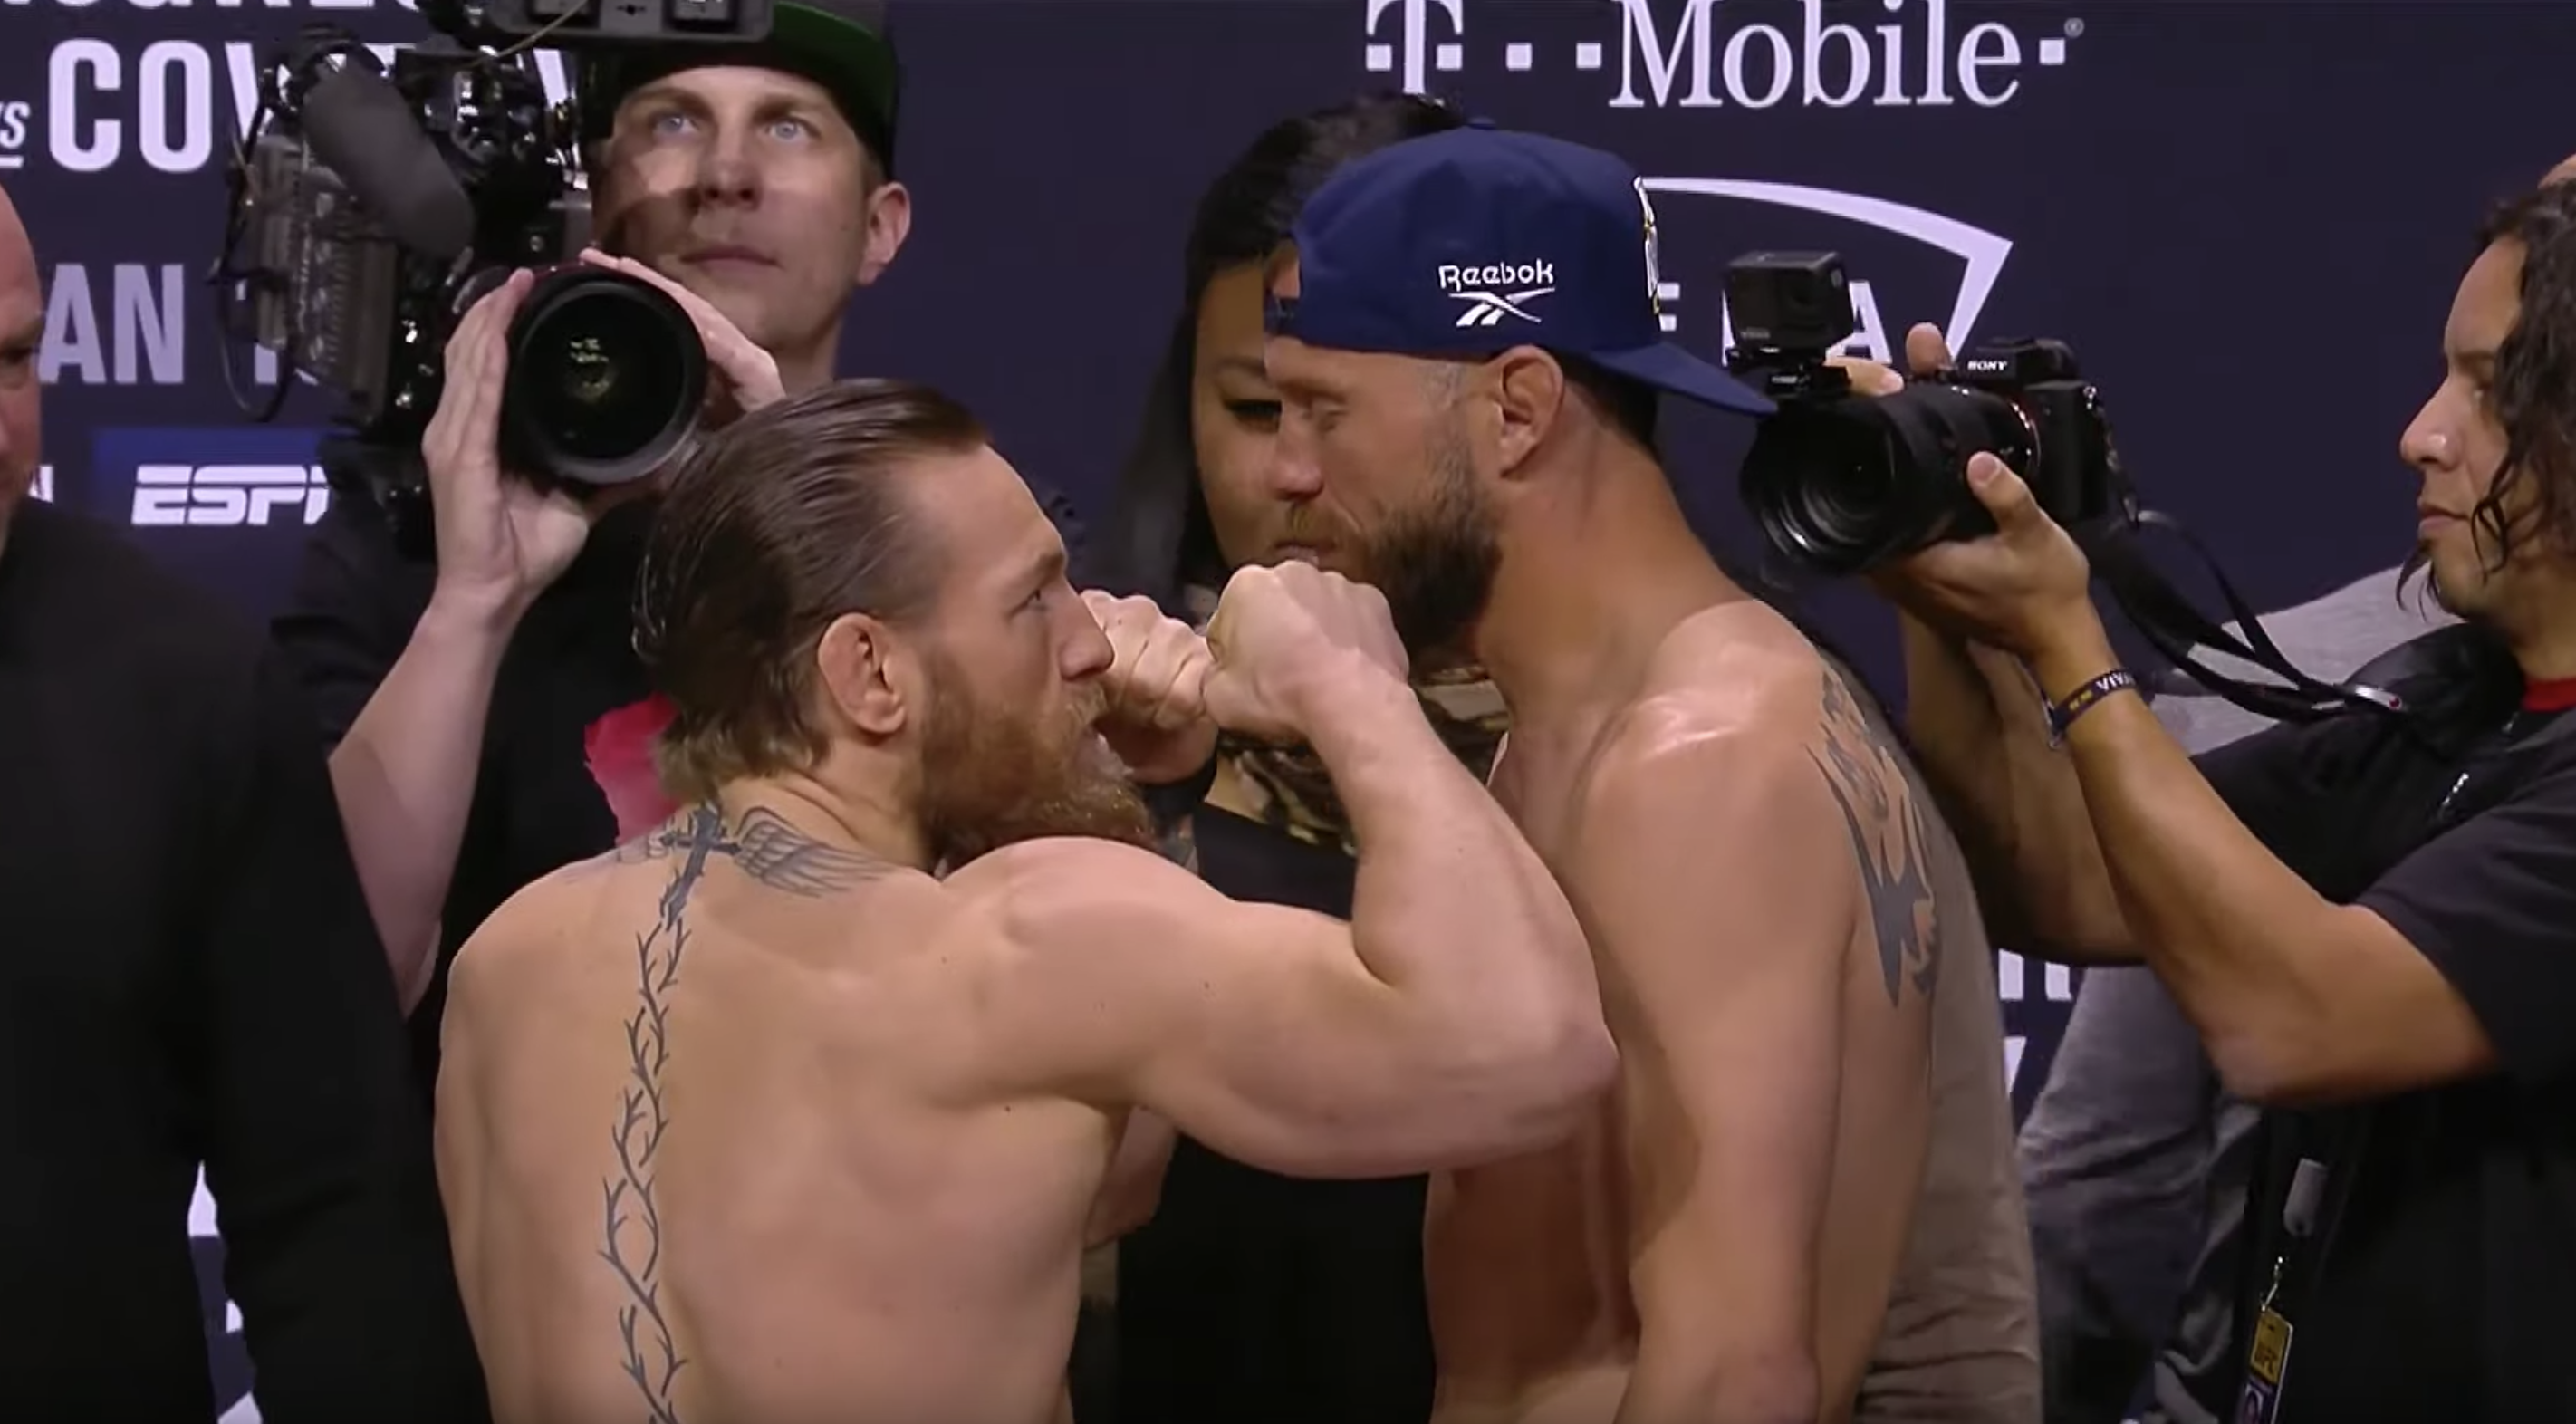 Watch UFC 246 featuring Conor McGregor and Donald Cerrone - Las Vegas